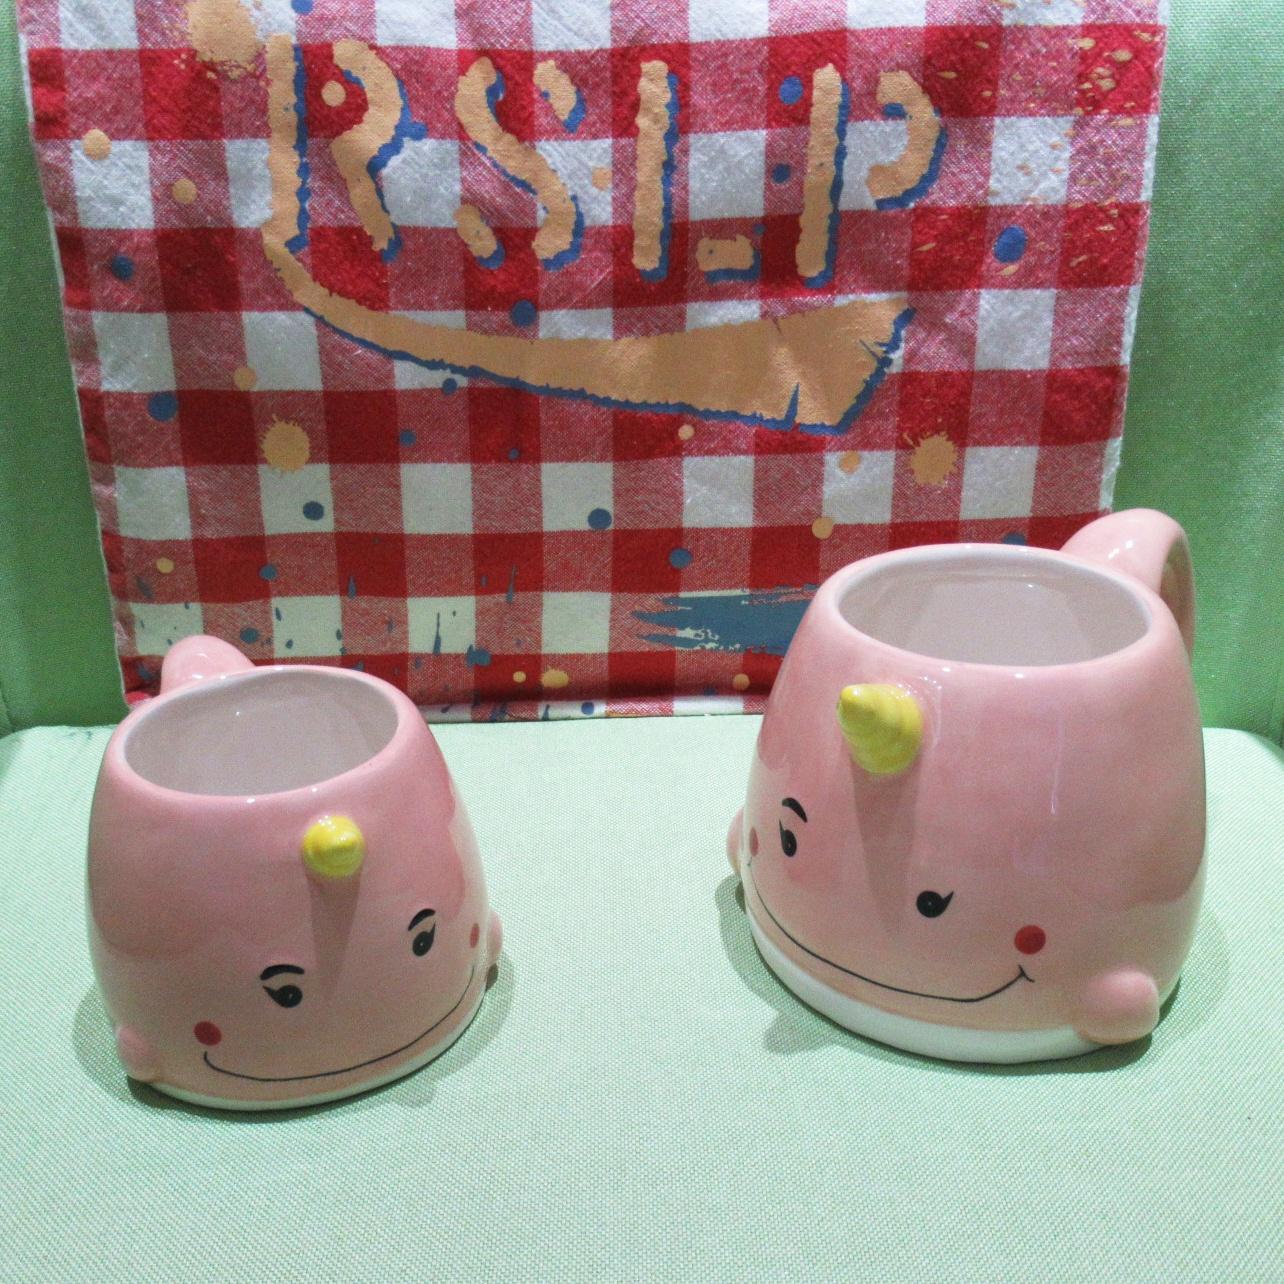 China suppliers glaze home goods ceramic mug coffee ceramic Narwhal Mug with handle new ceramic cup